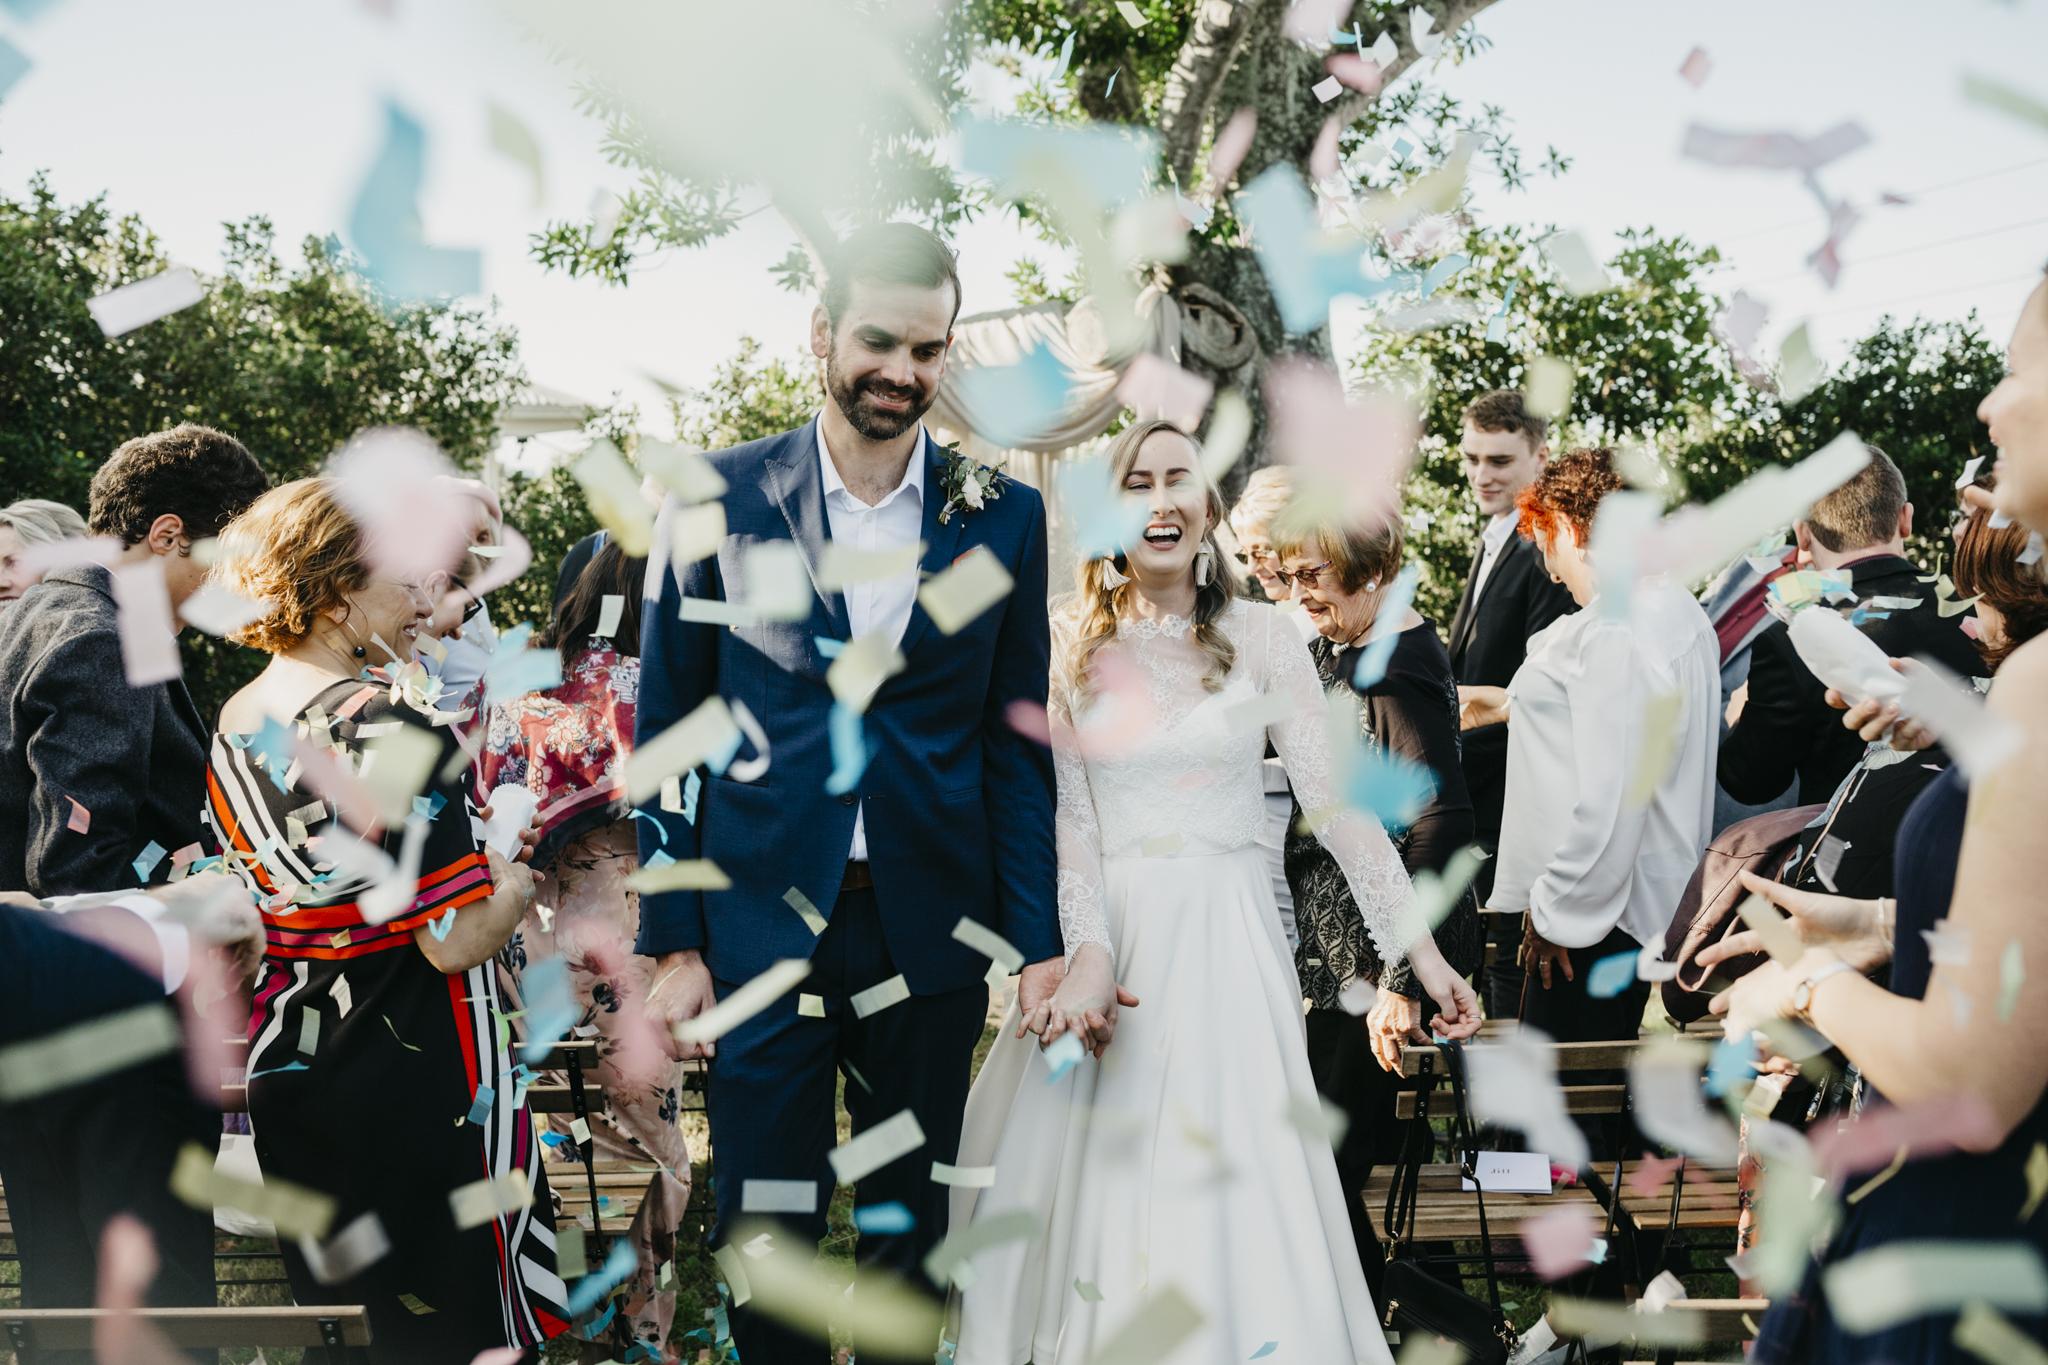 Gold Coast wedding confetti toss